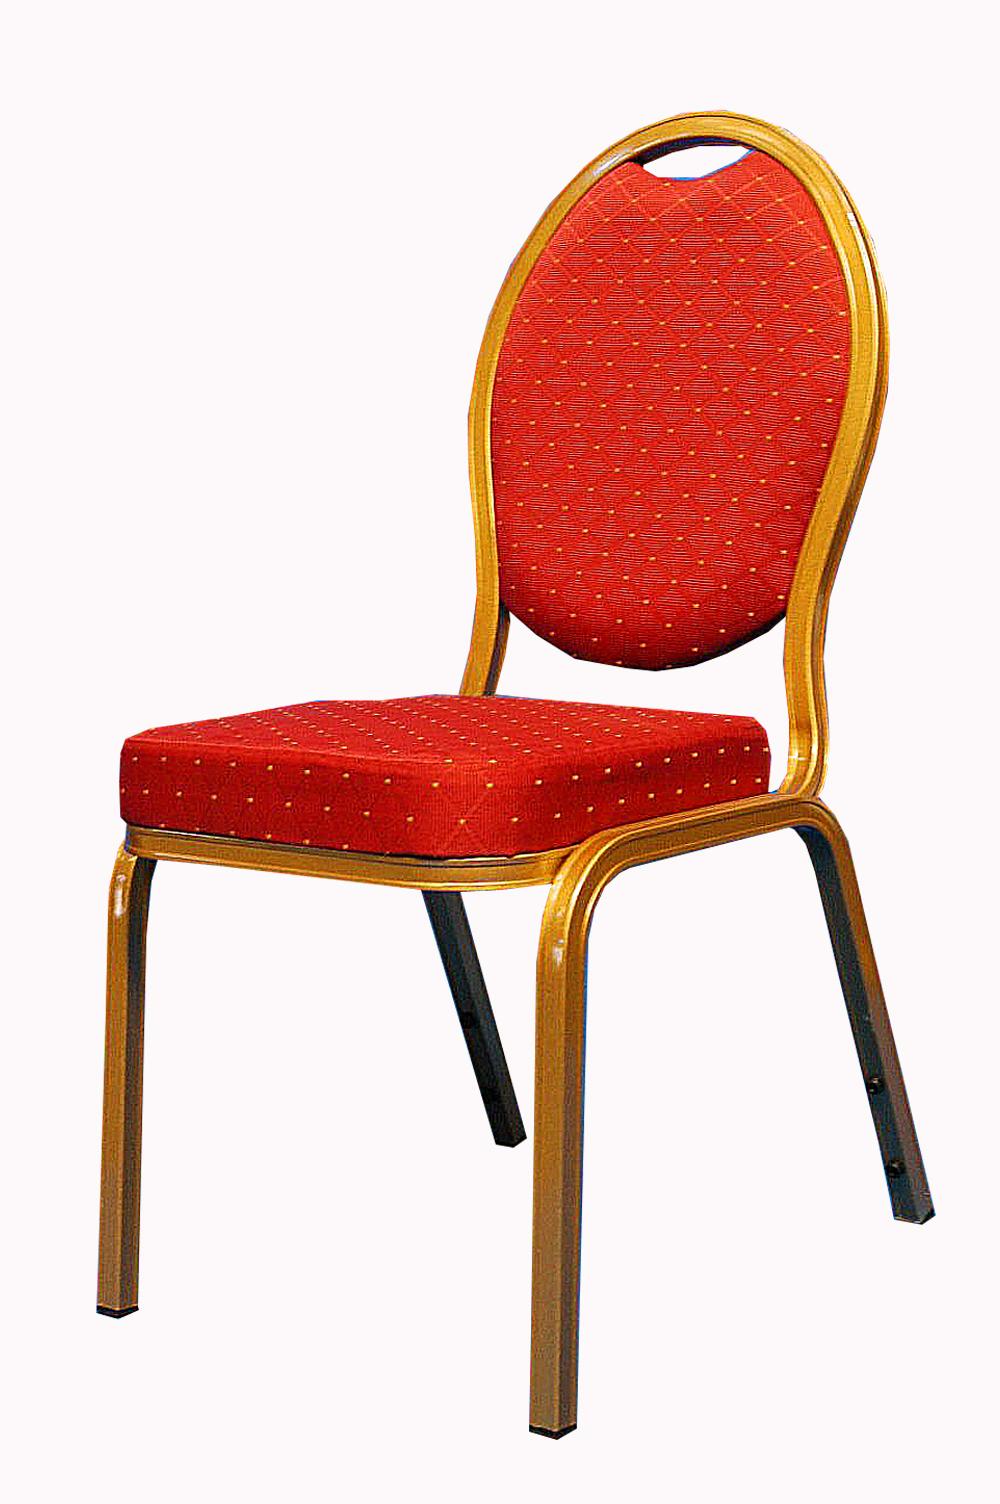 Alquileres de silla americana - Sillas altas para cocina americana ...